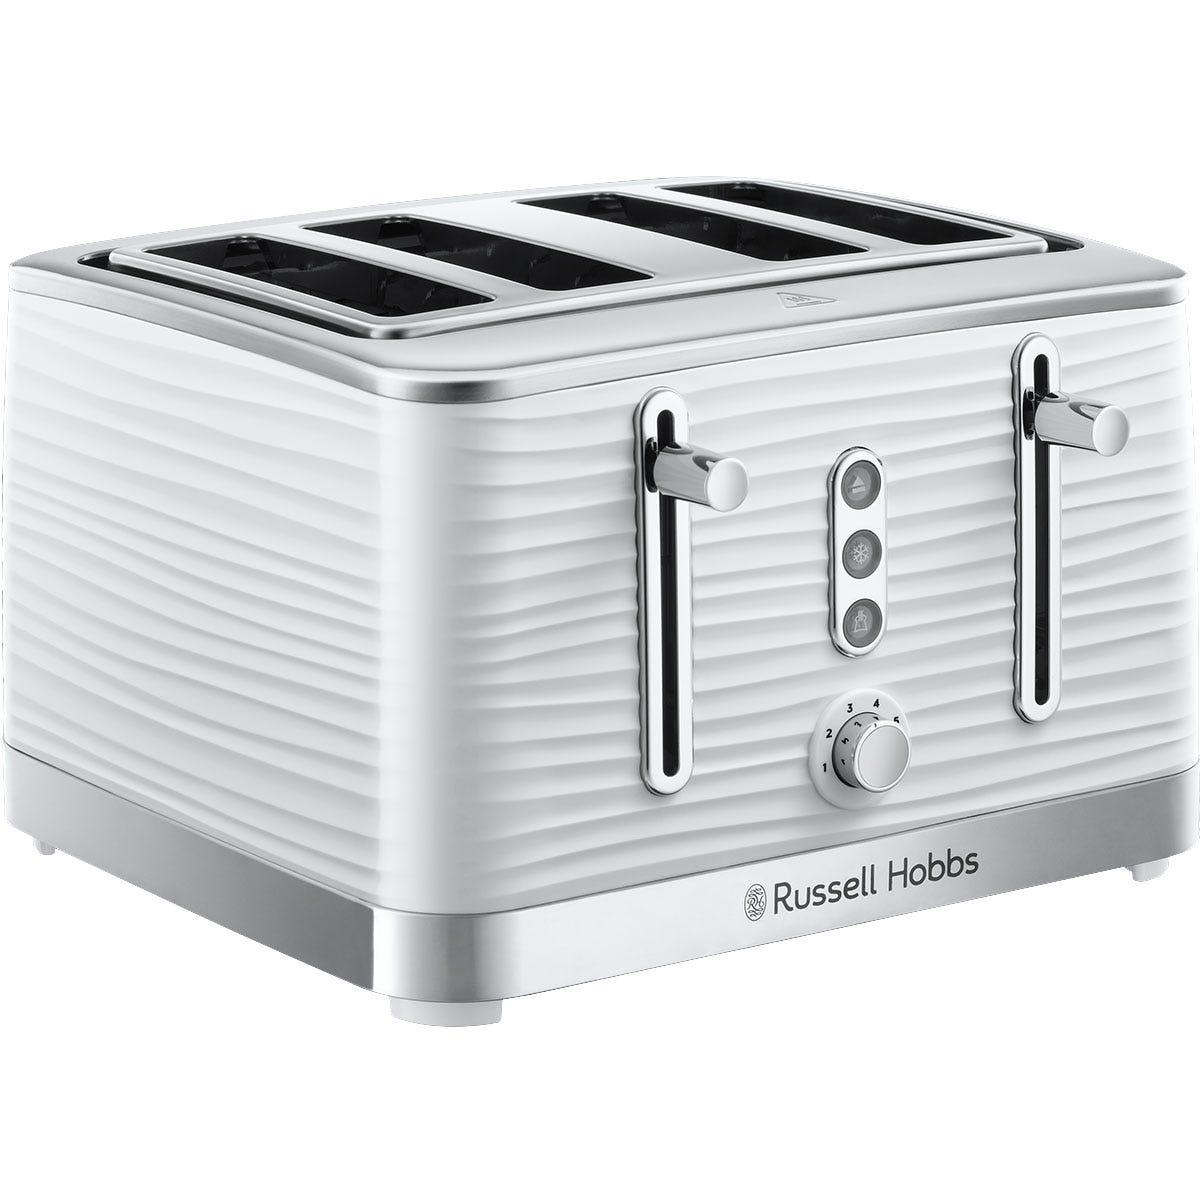 Russell Hobbs Inspire Toaster